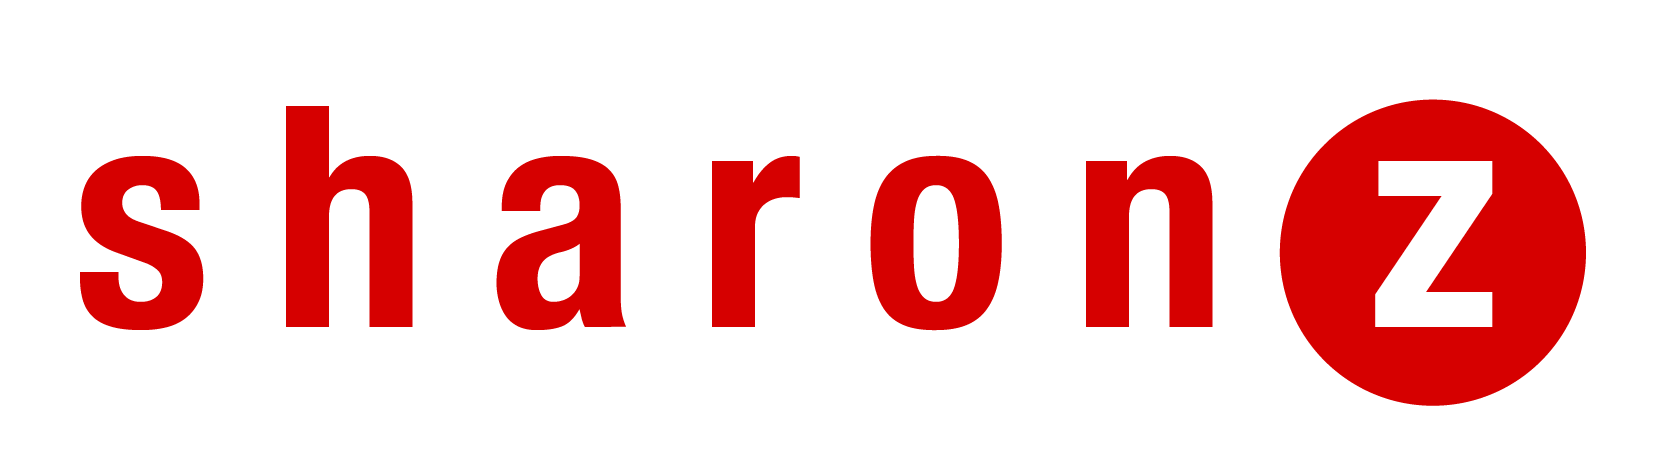 Sharon Z